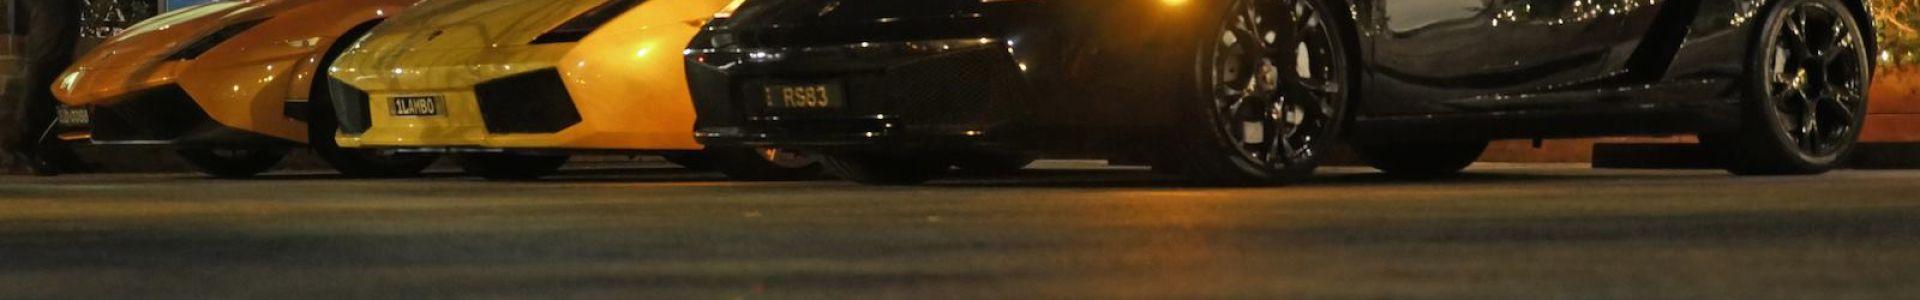 Ferrari's at night